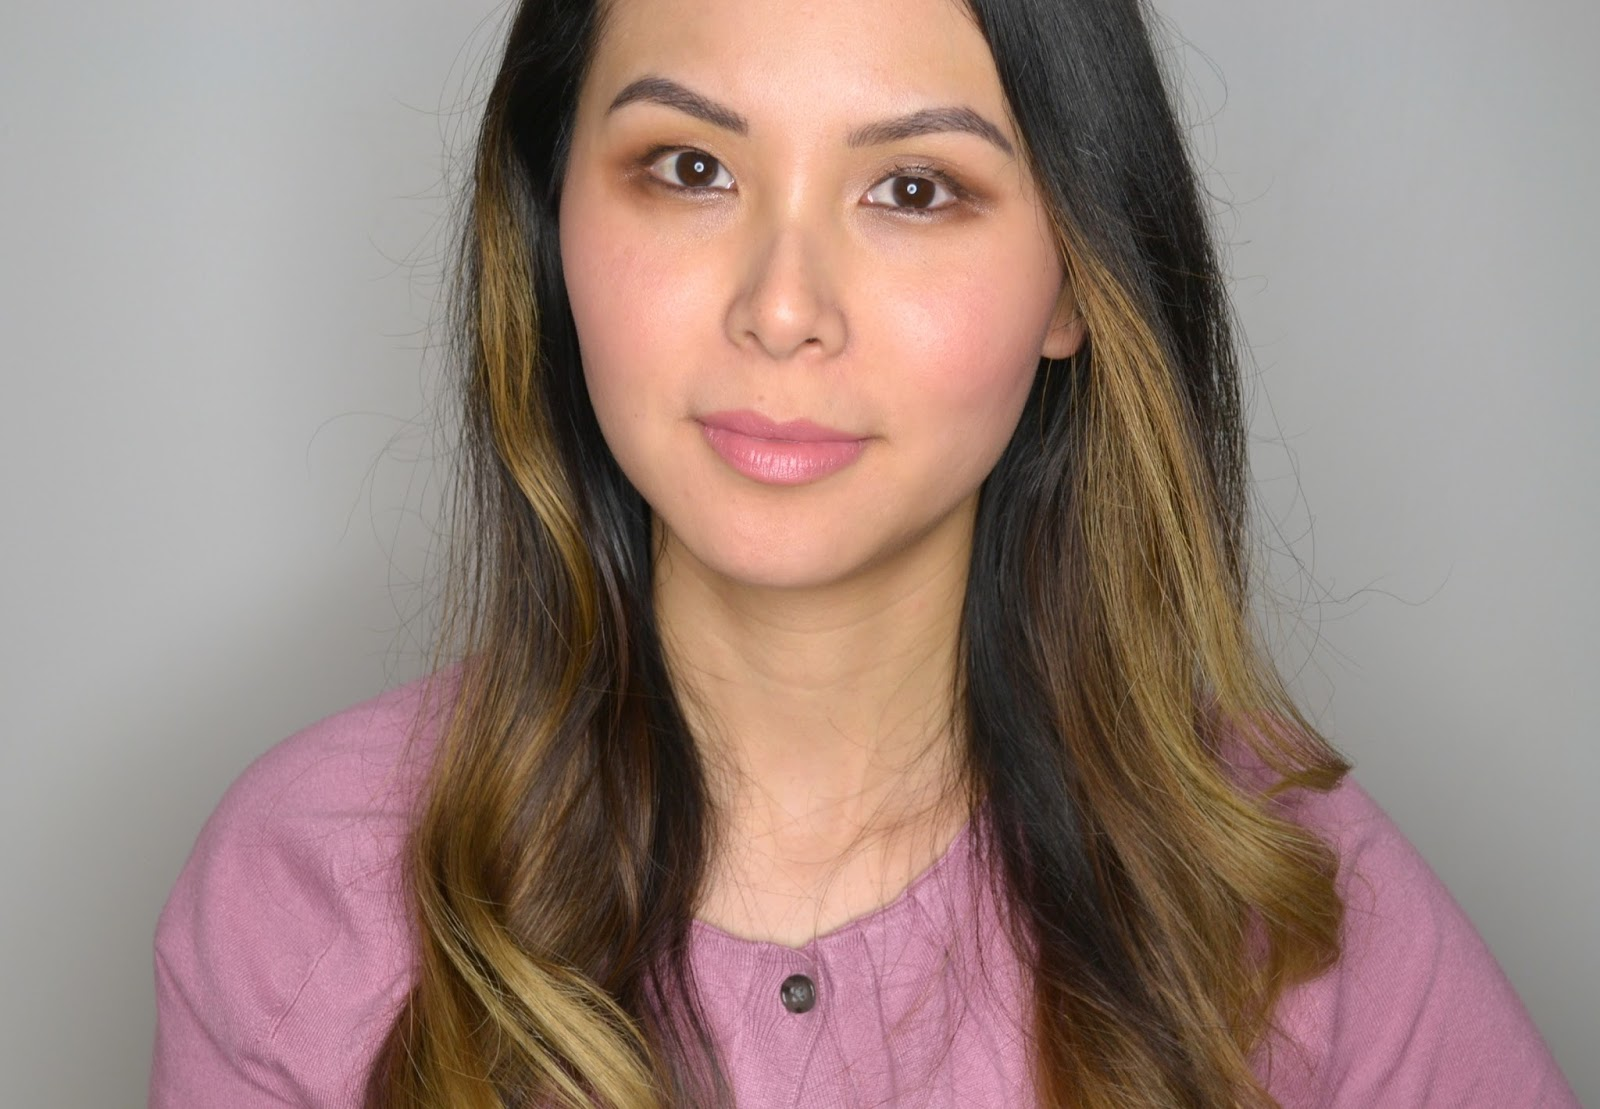 Eyebrow microblading: reviews, description of the procedure. Eyebrow care after microblading 57